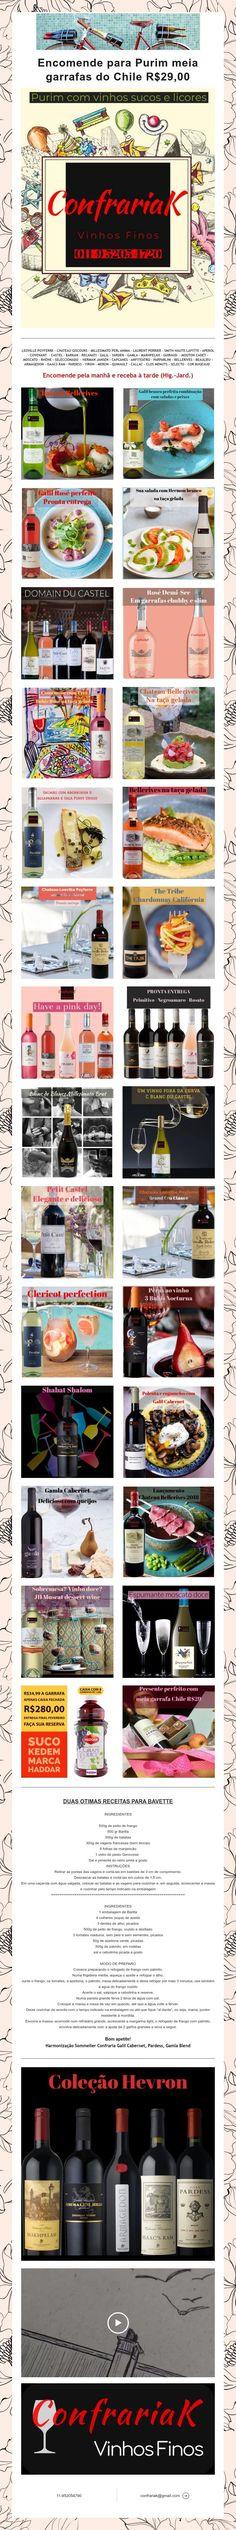 Encomende para Purim meia garrafas do Chile R$29,00 Chile, Wine Pairings, Sock, Bottles, Chili